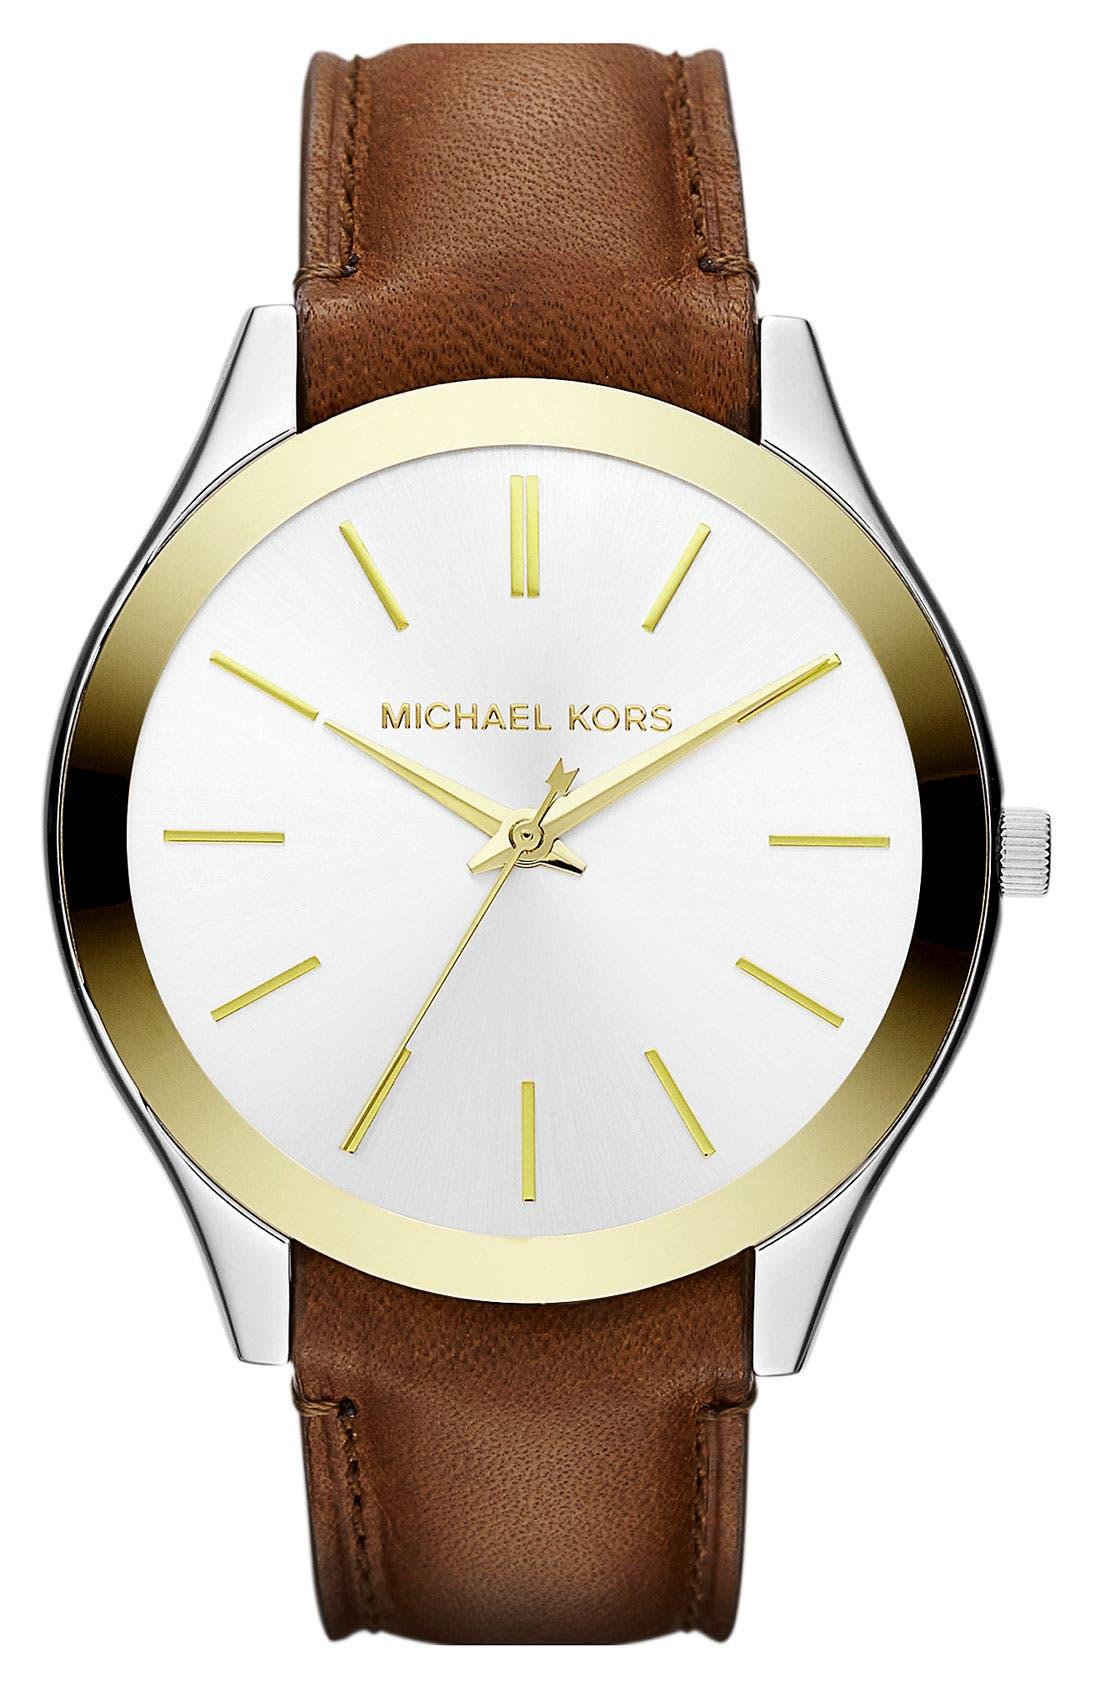 Michael Kors 'Slim Runway' Leather Strap Watch, 42mm,                             Main thumbnail 1, color,                             200